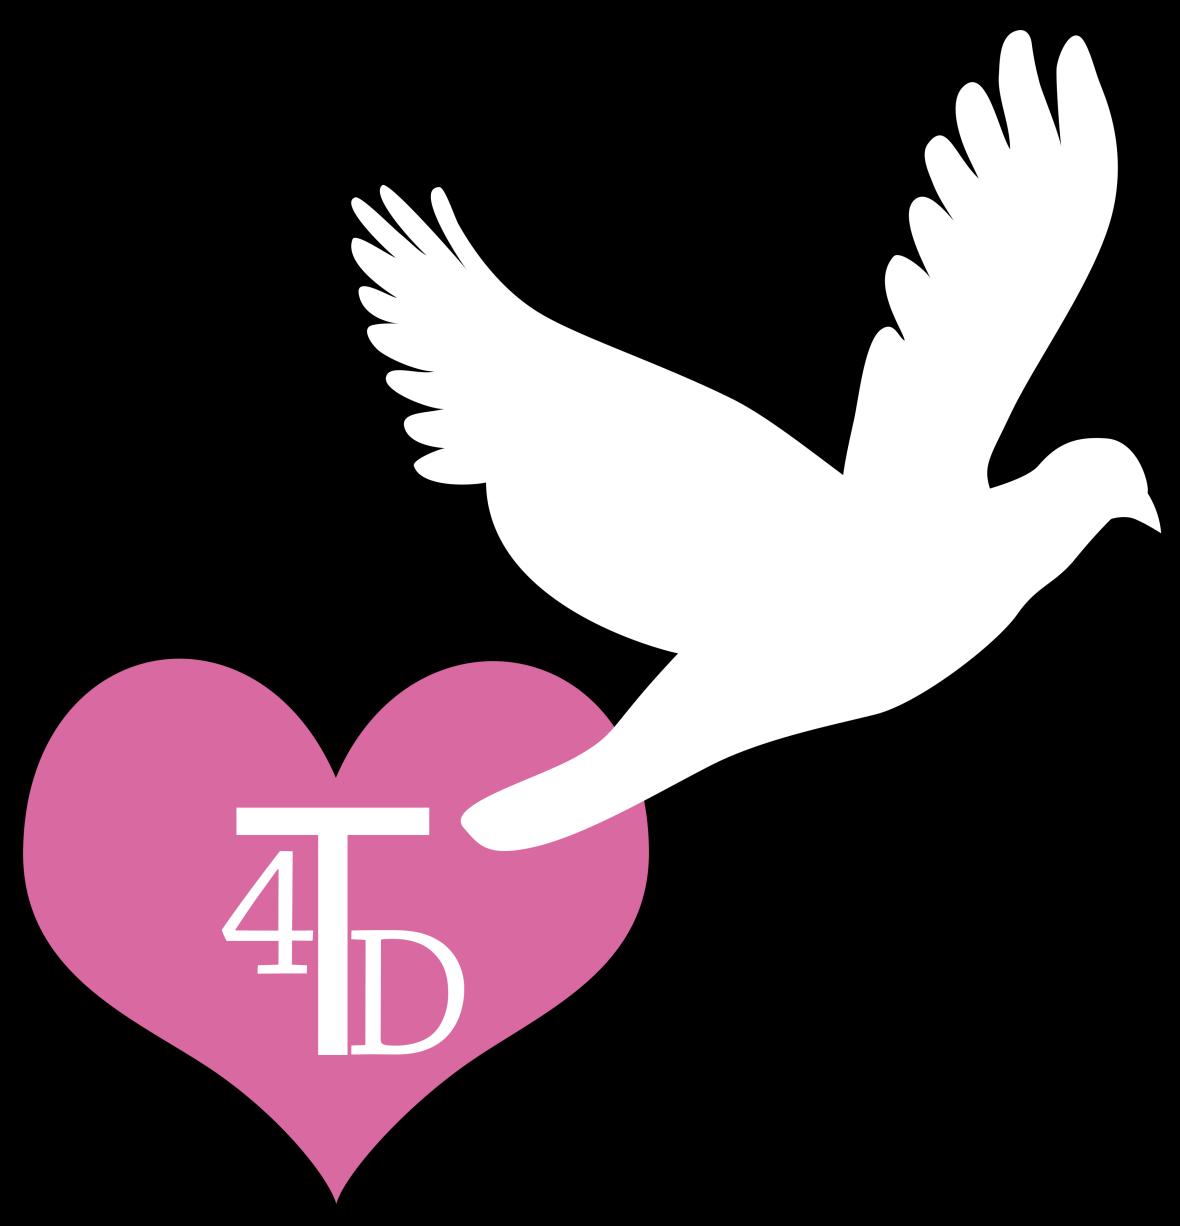 4TD logo final